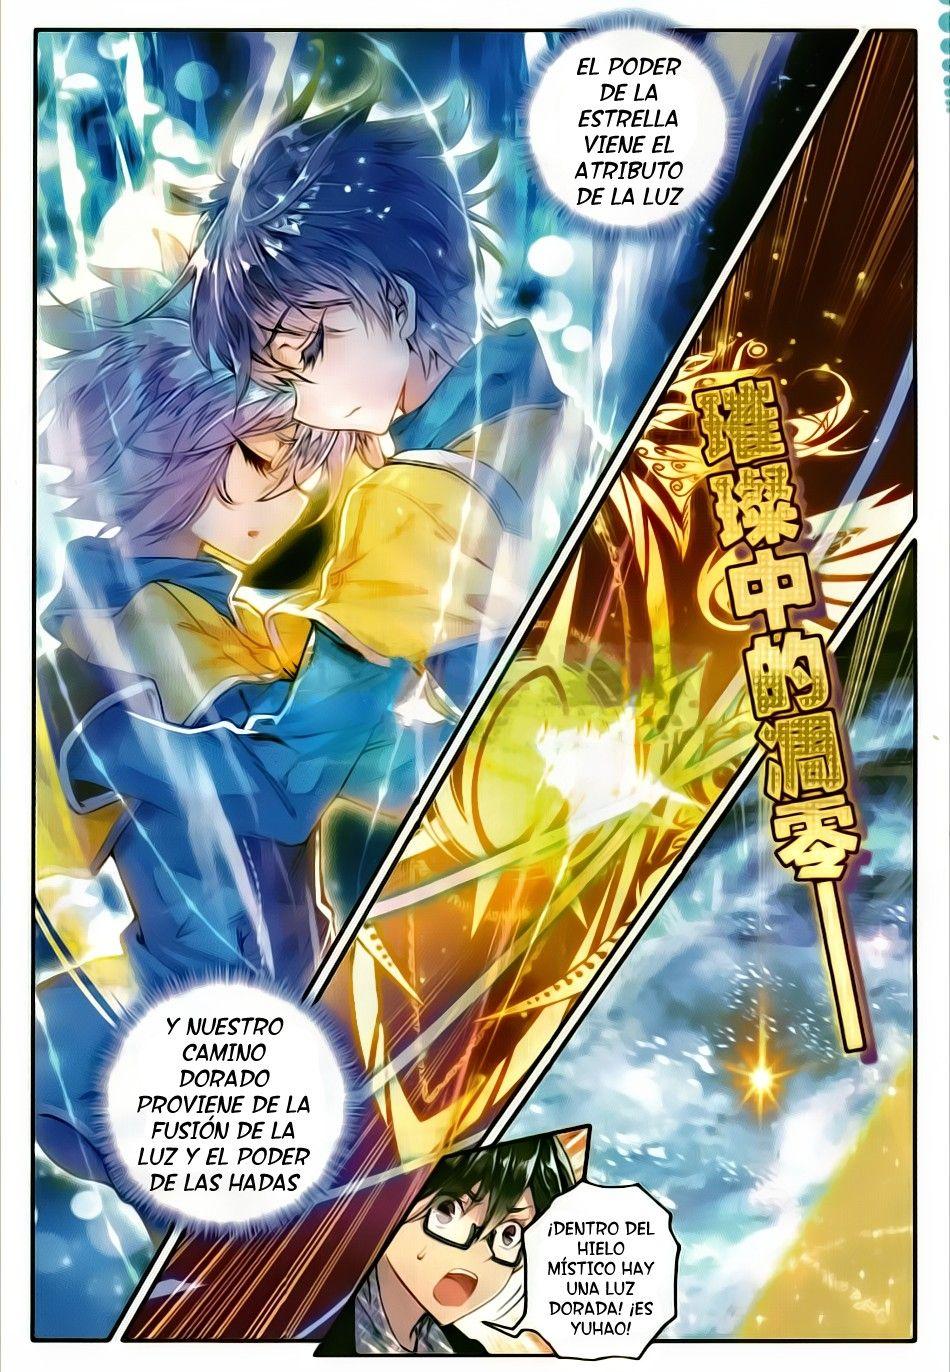 https://c5.ninemanga.com/es_manga/pic2/33/16417/511293/7effc8914773ffc145f87c2da63fade2.jpg Page 5